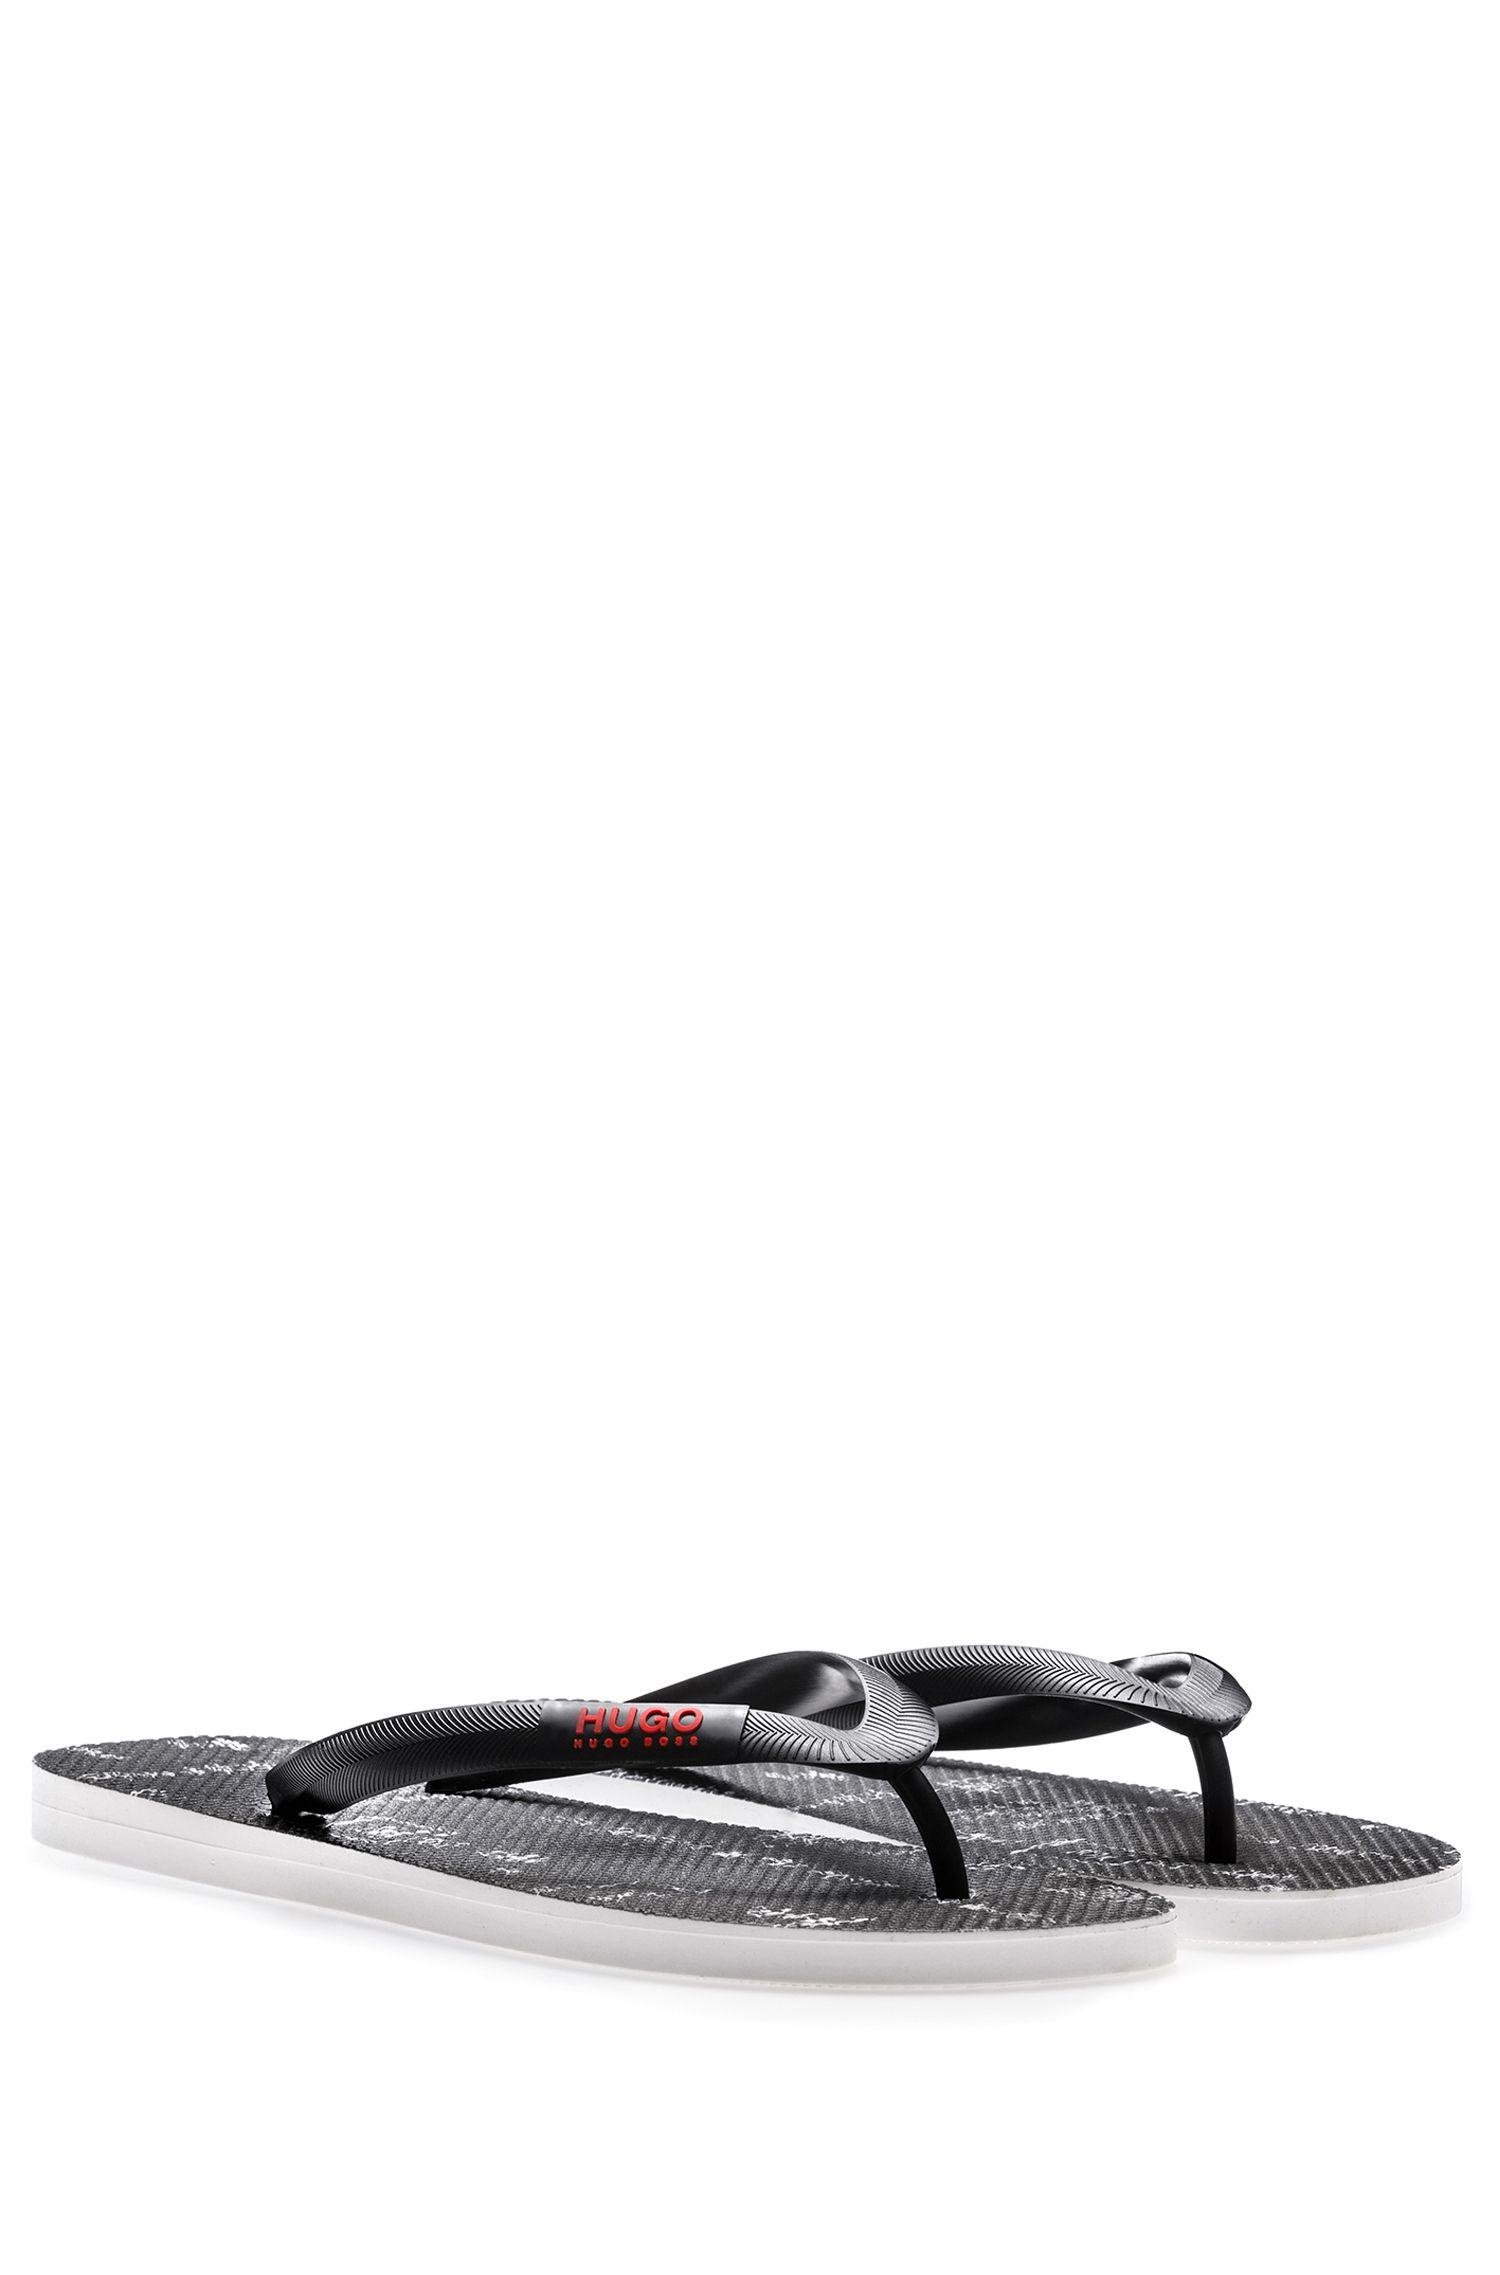 Toe-post flip-flops with seasonal artwork HUGO BOSS